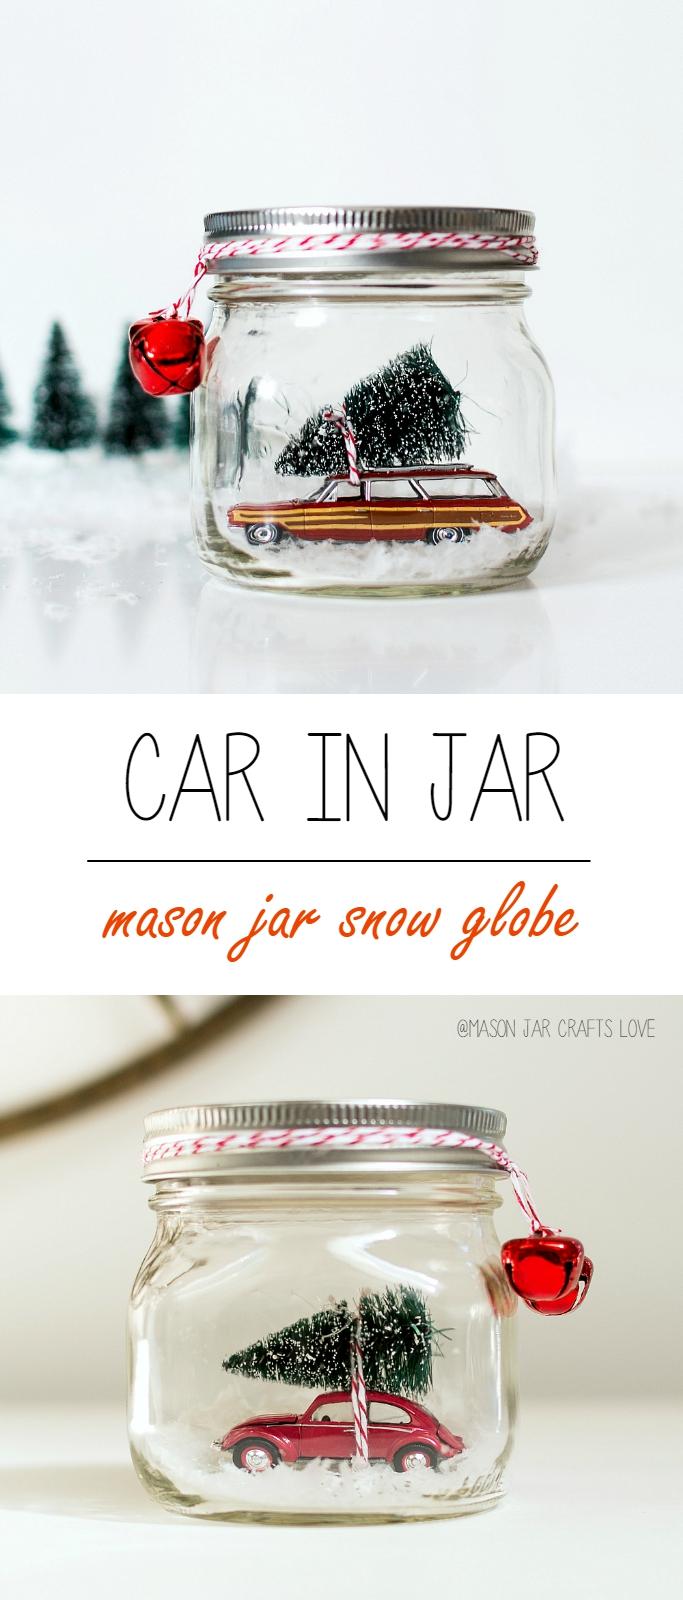 Car In Jar Snow Globe